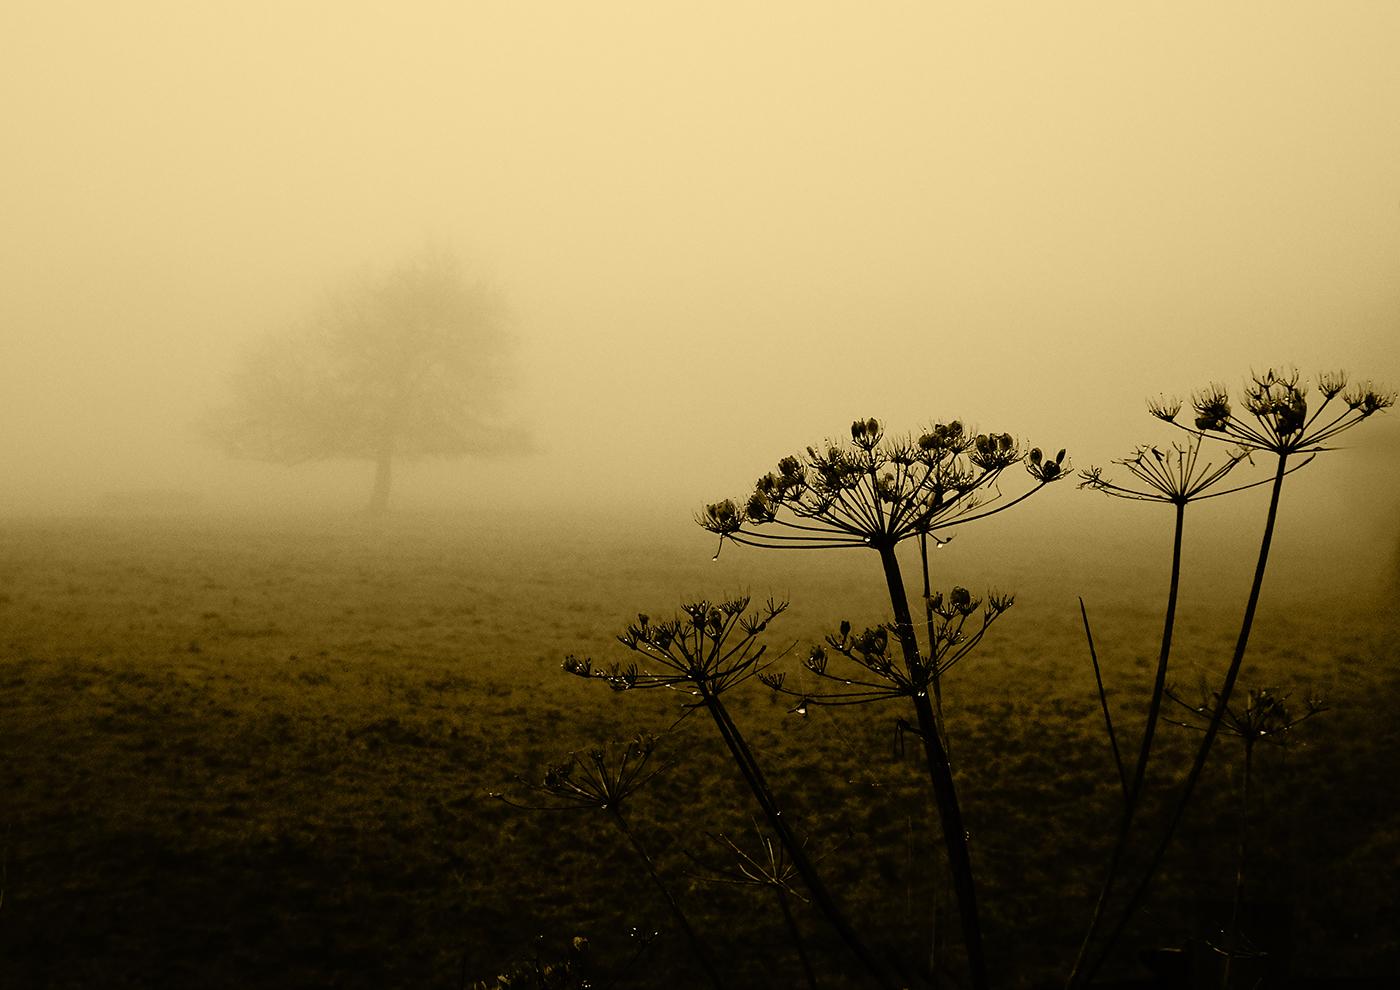 'Misty Morning by Sally Money